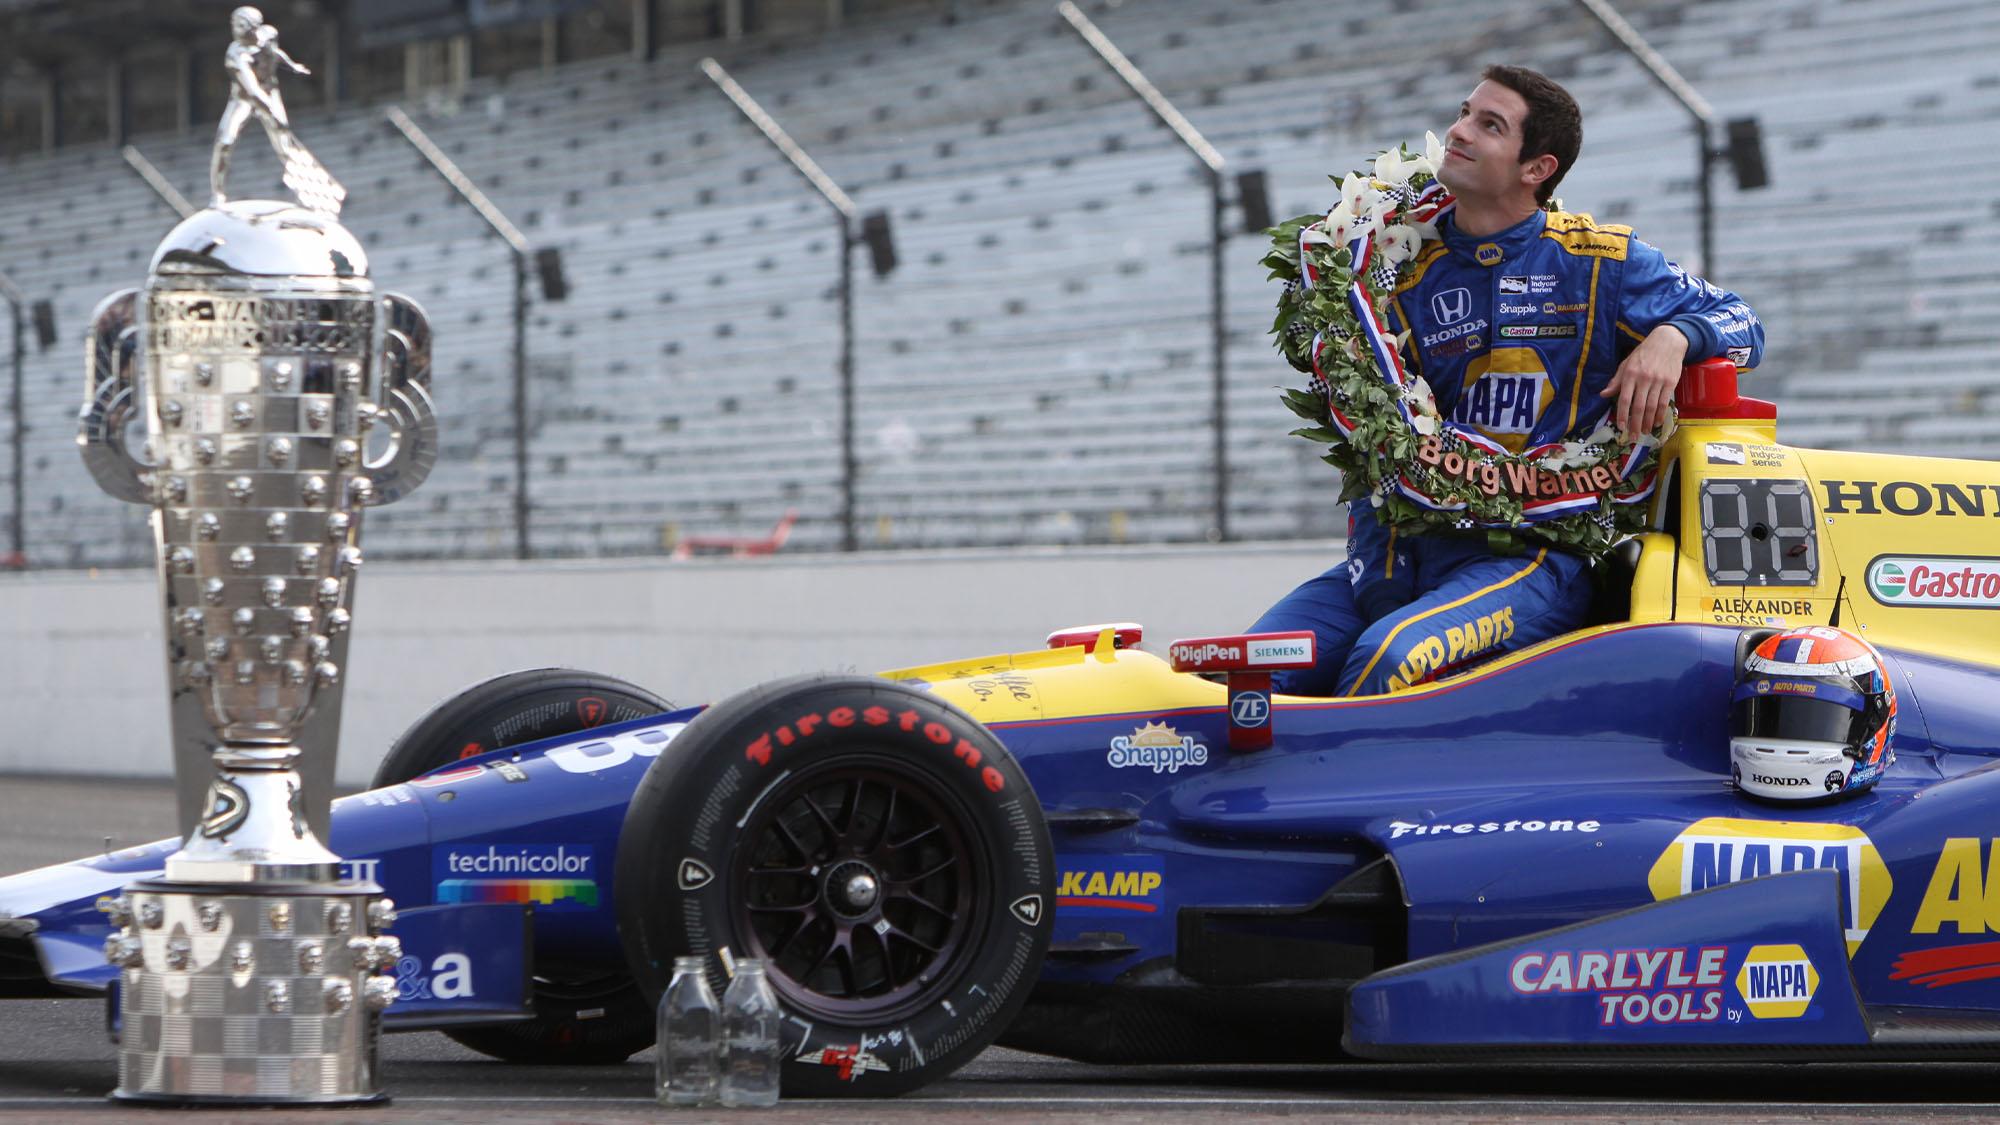 Alexander Rossi 2016 Indy 500